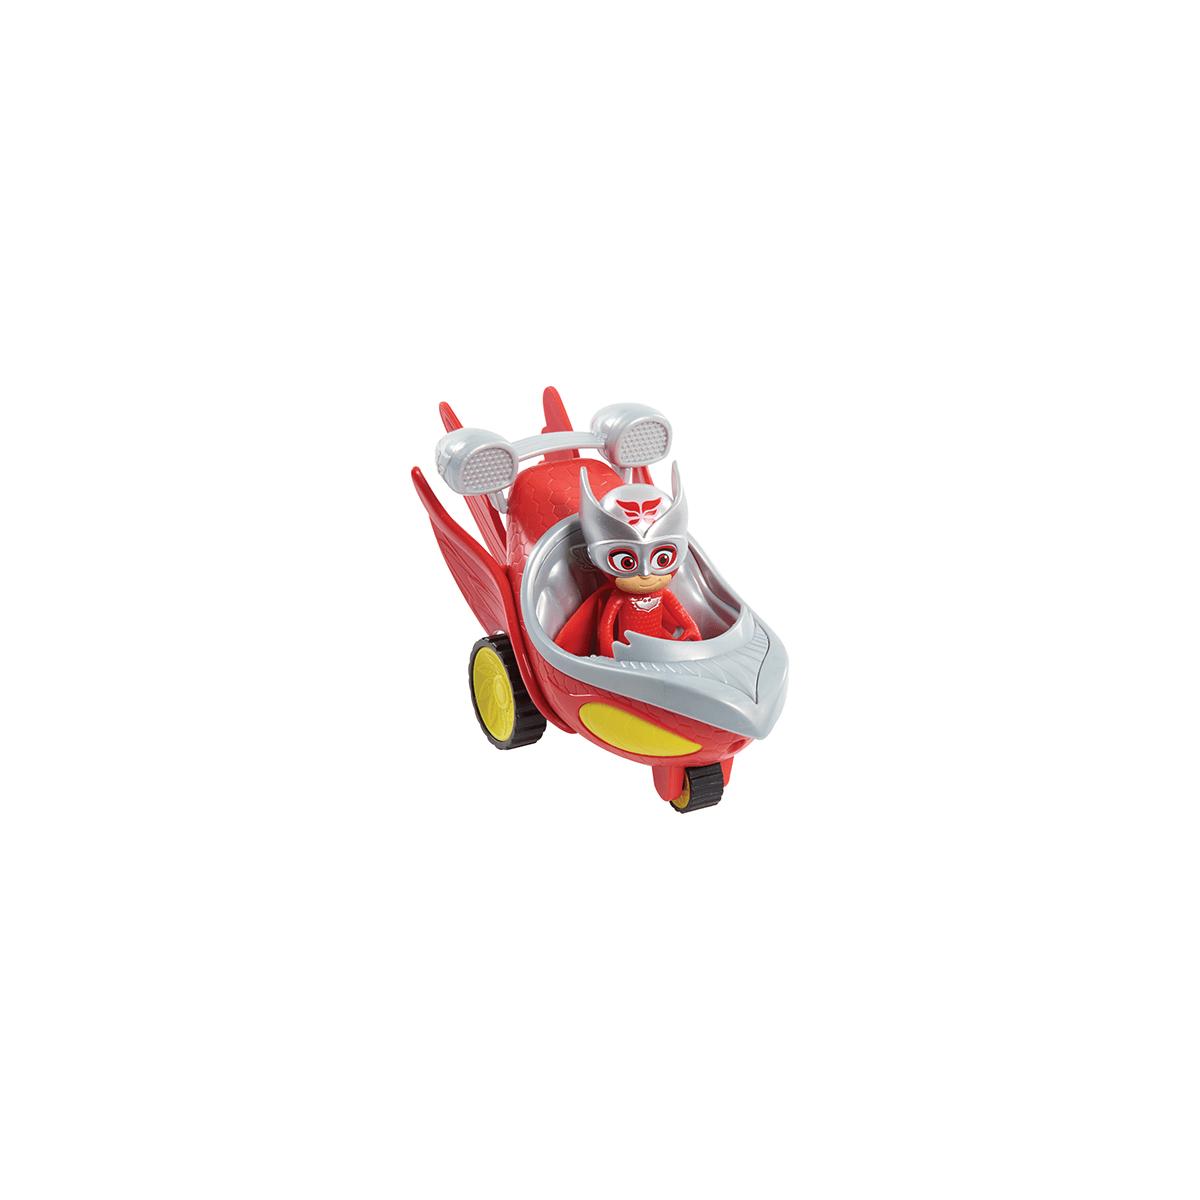 PJ Masks Speed Booster Vehicle & Figure - Owlette